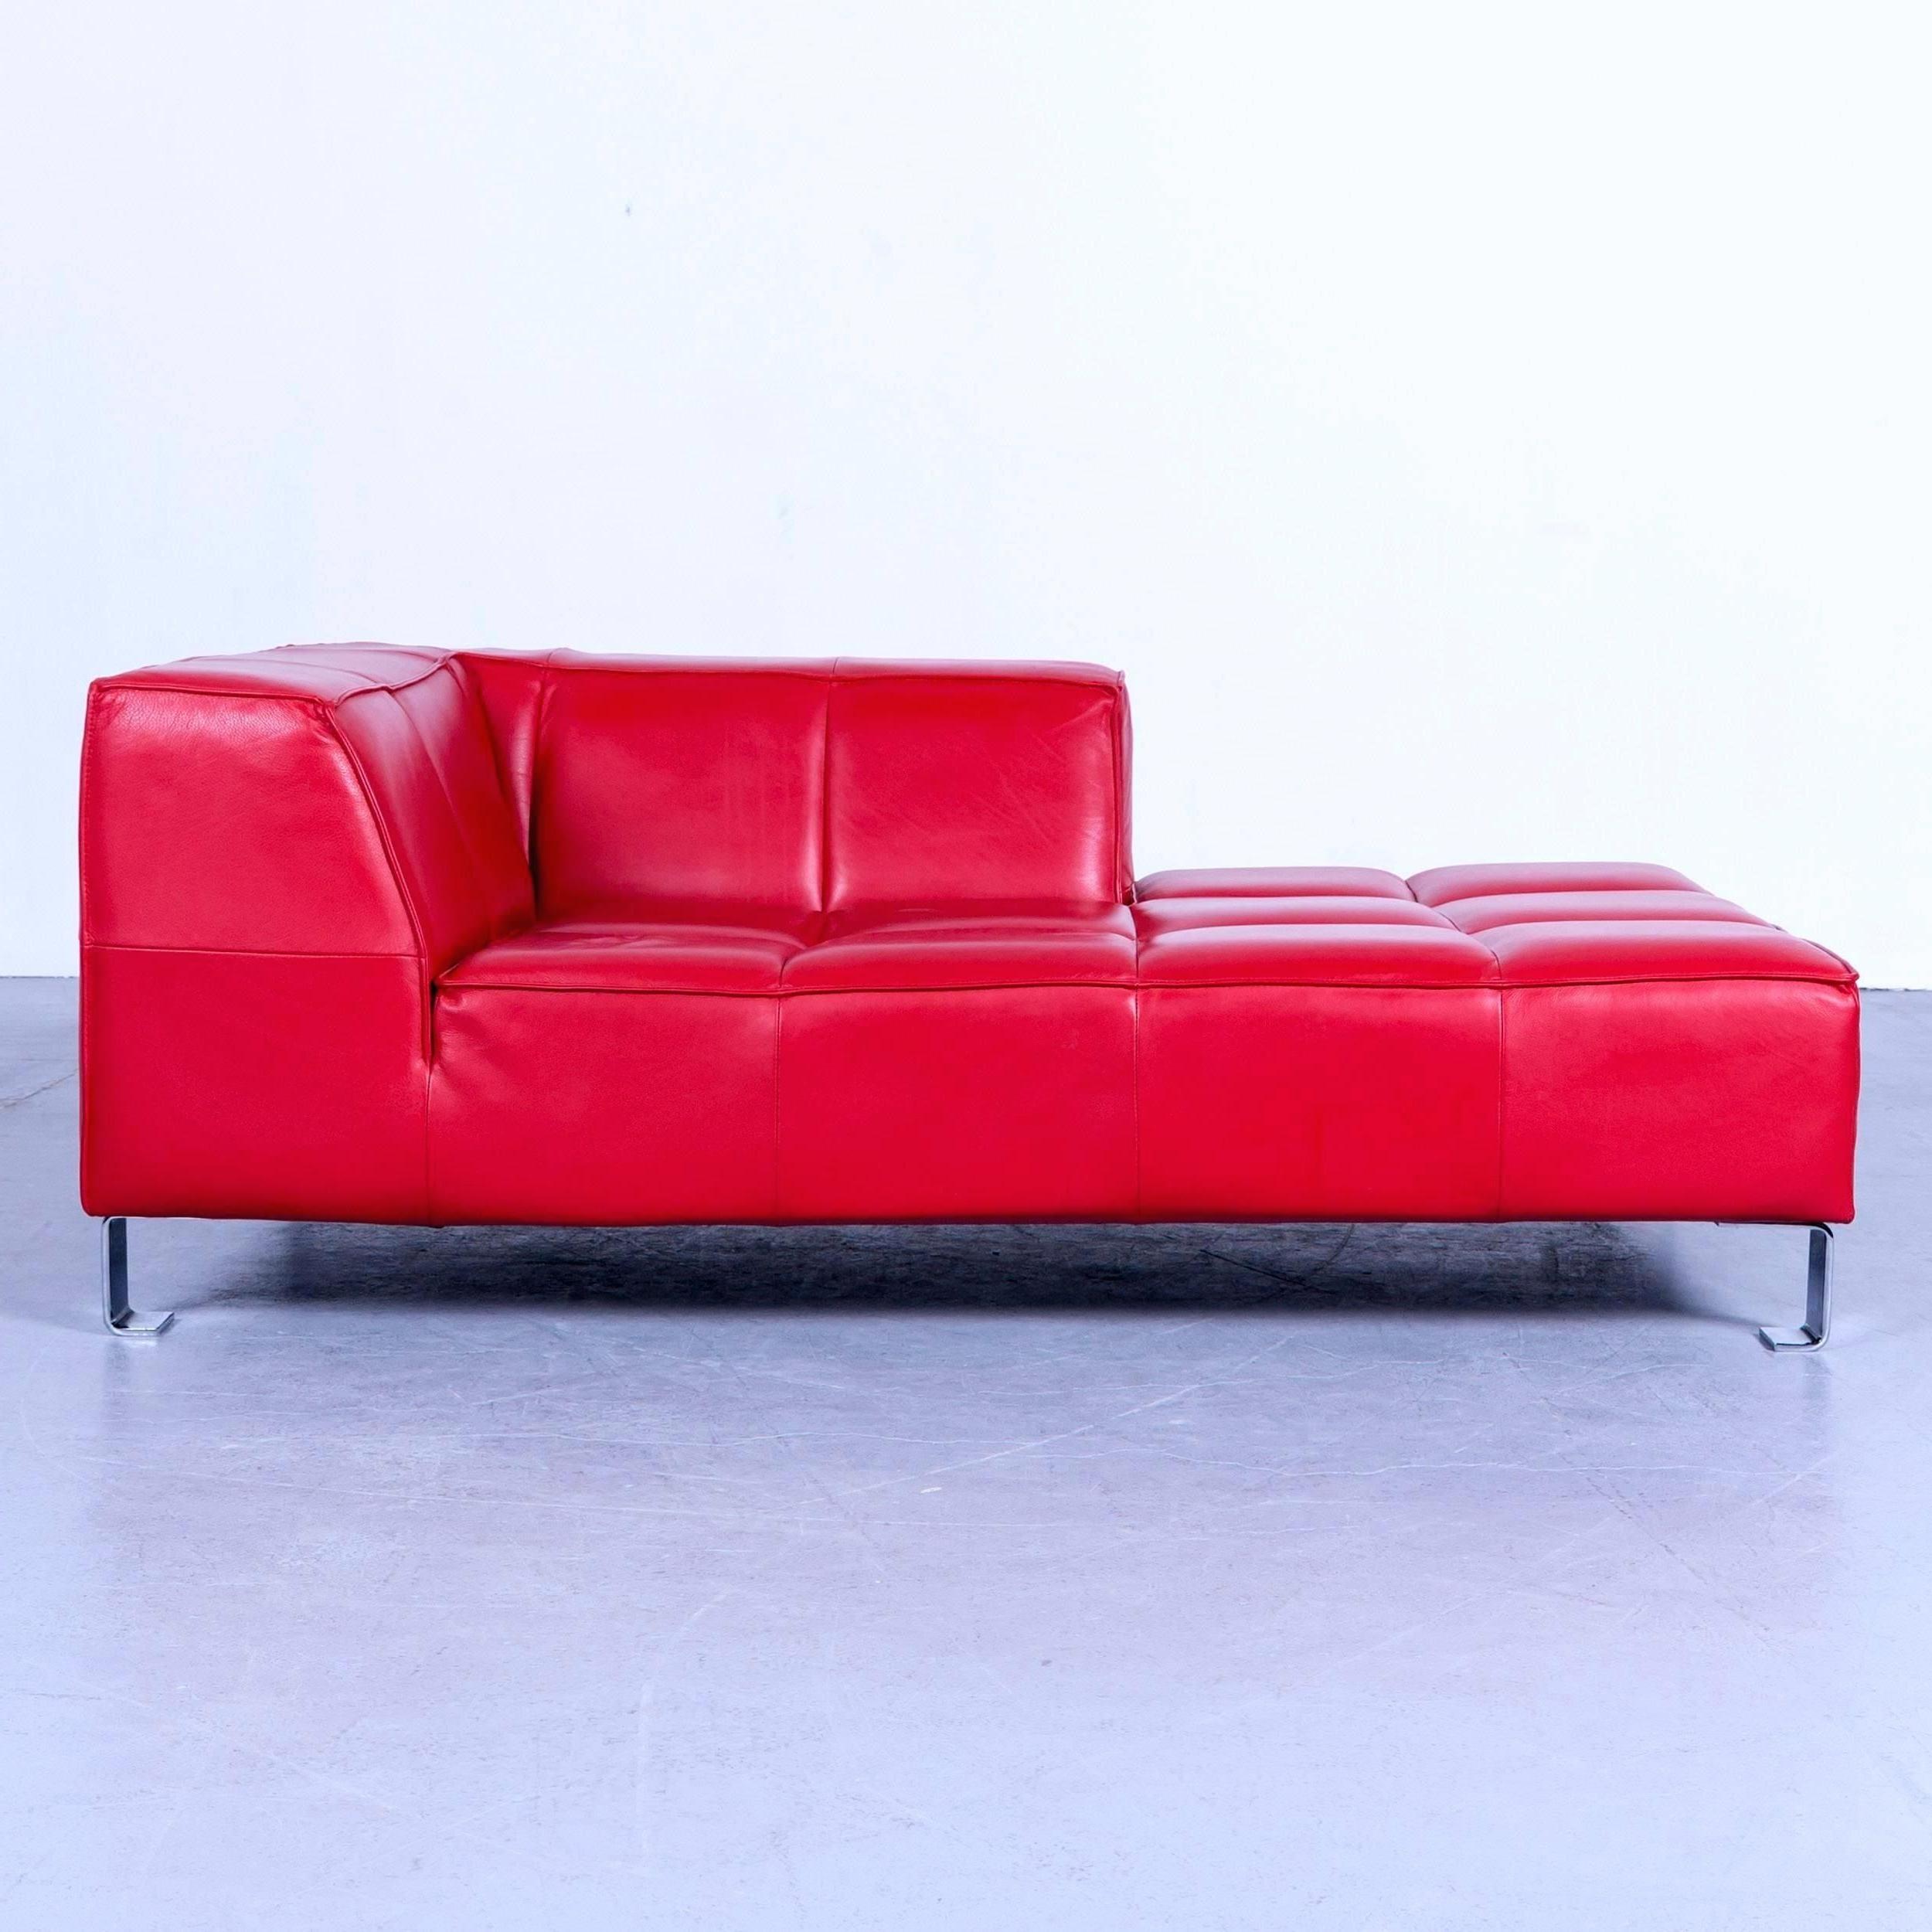 Sofa Relax Ikea E6d5 Conforama sofas Relax Lujo Imagenes Zweiersofa Mit Schlaffunktion